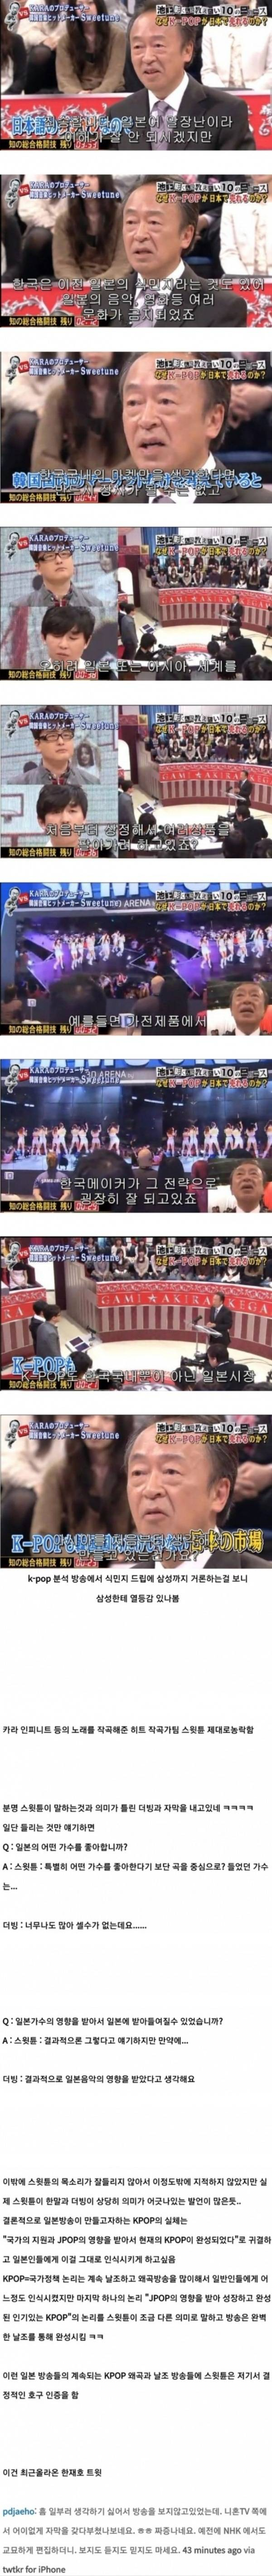 K-pop 분석한다는 일본방송에서 농락당한 한국 작곡팀 스윗튠   인스티즈